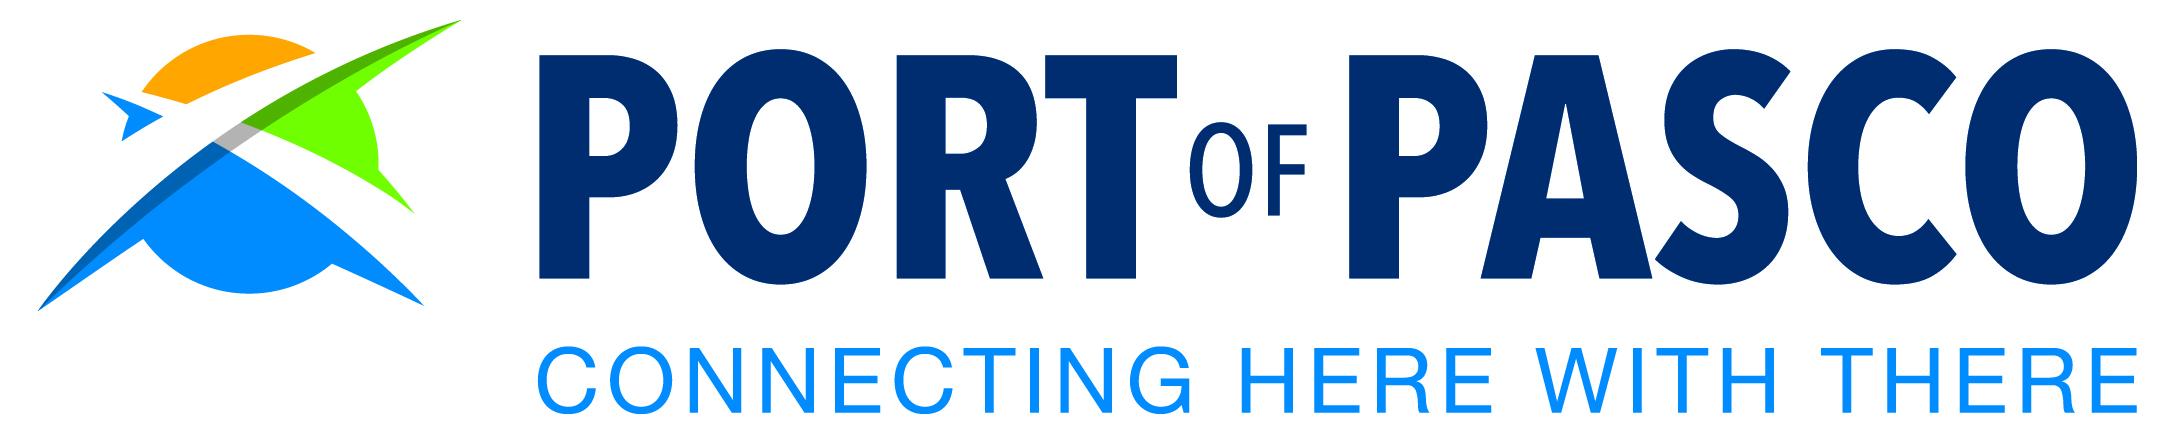 Logo_PortofPasco.jpg